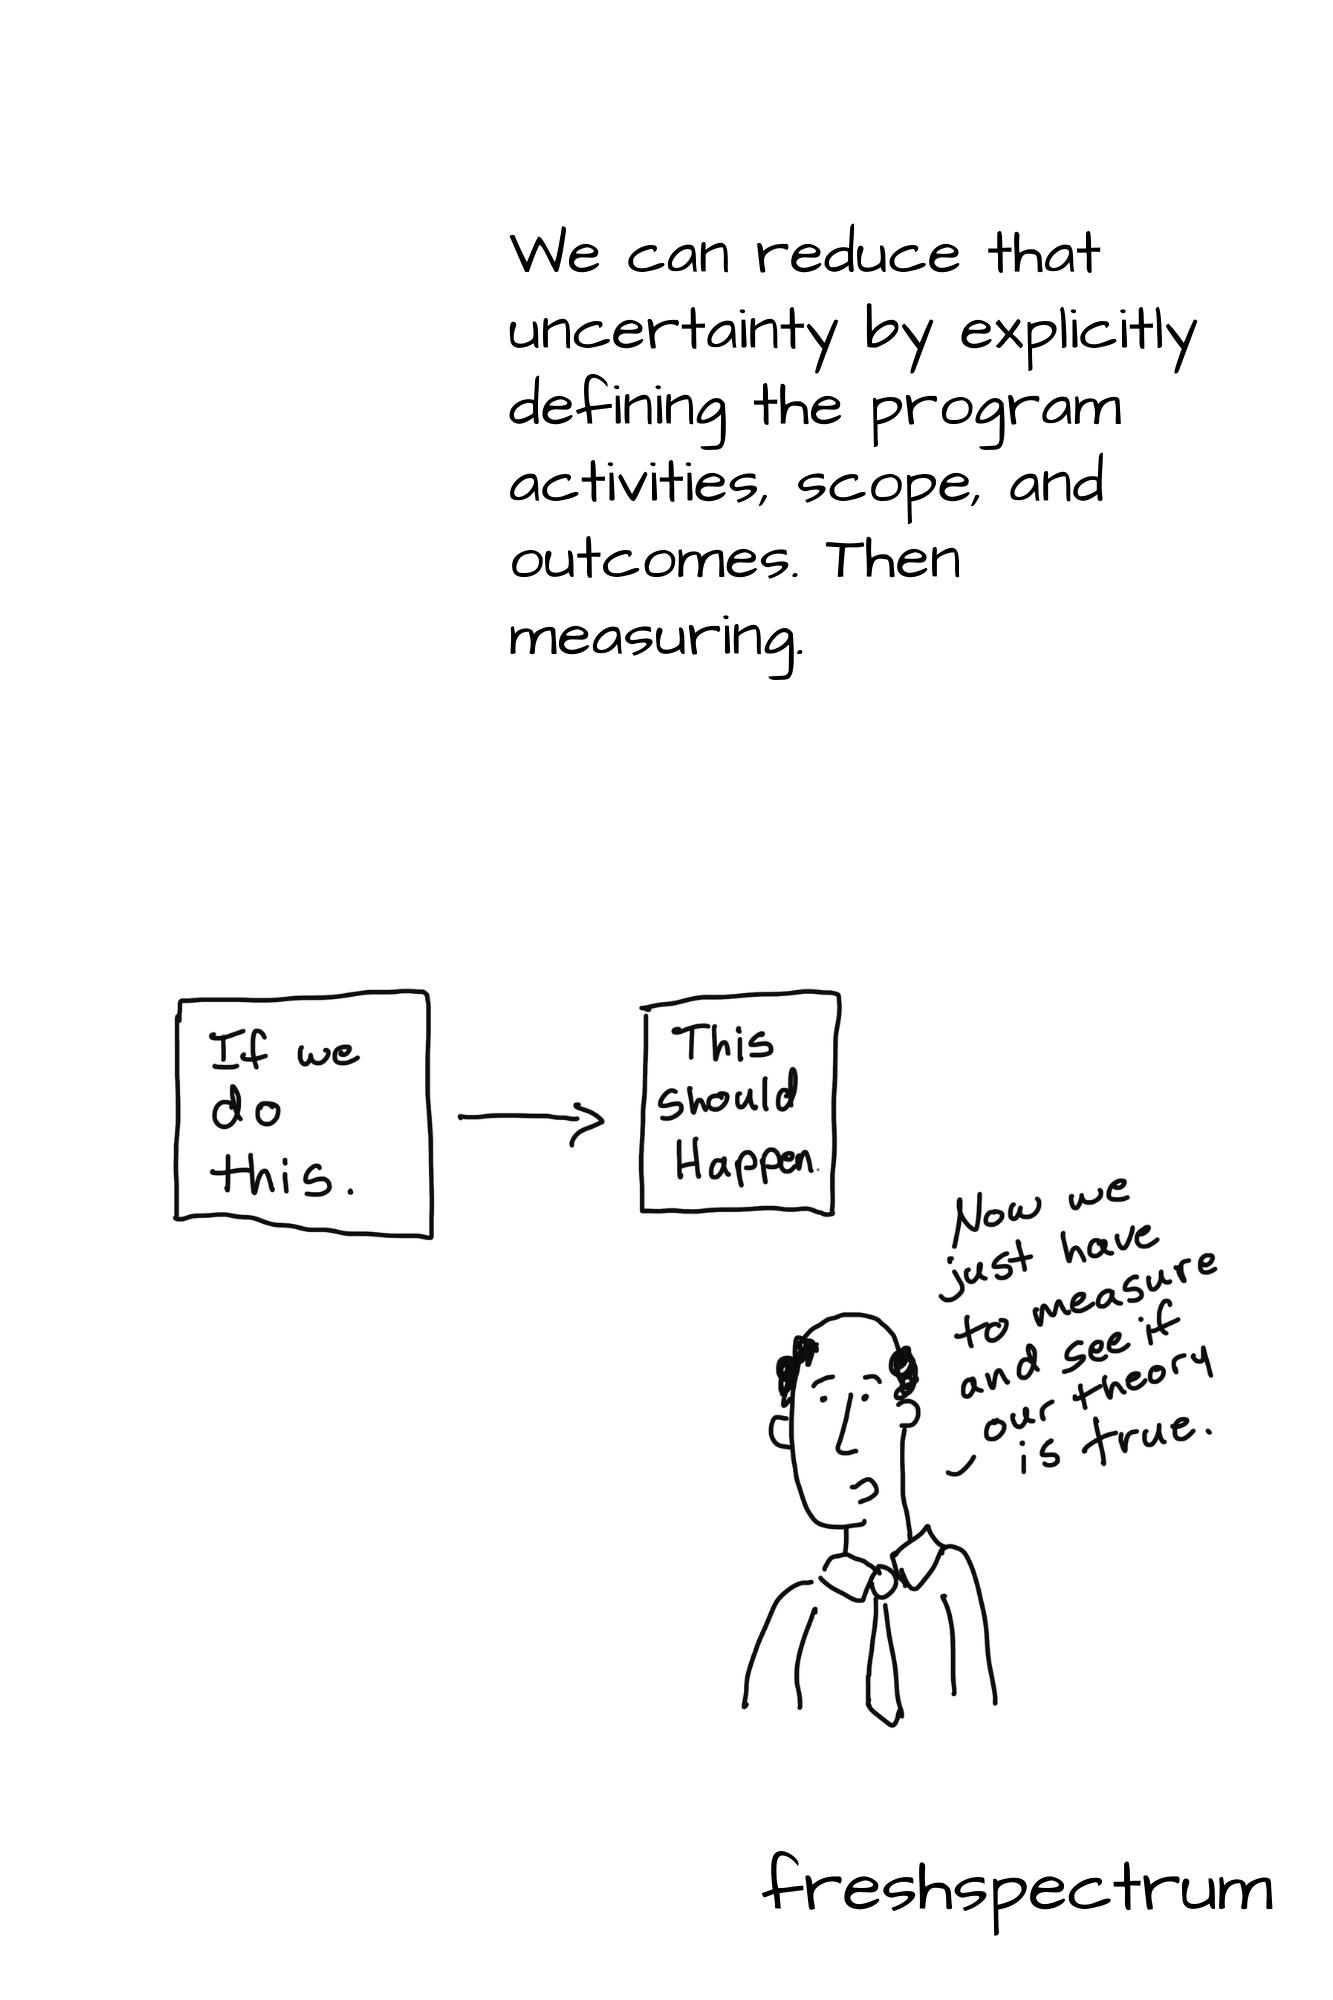 Shrodinger's Outcome Graphic Novella by Chris Lysy of freshspectrum.com.  Illustration 8.